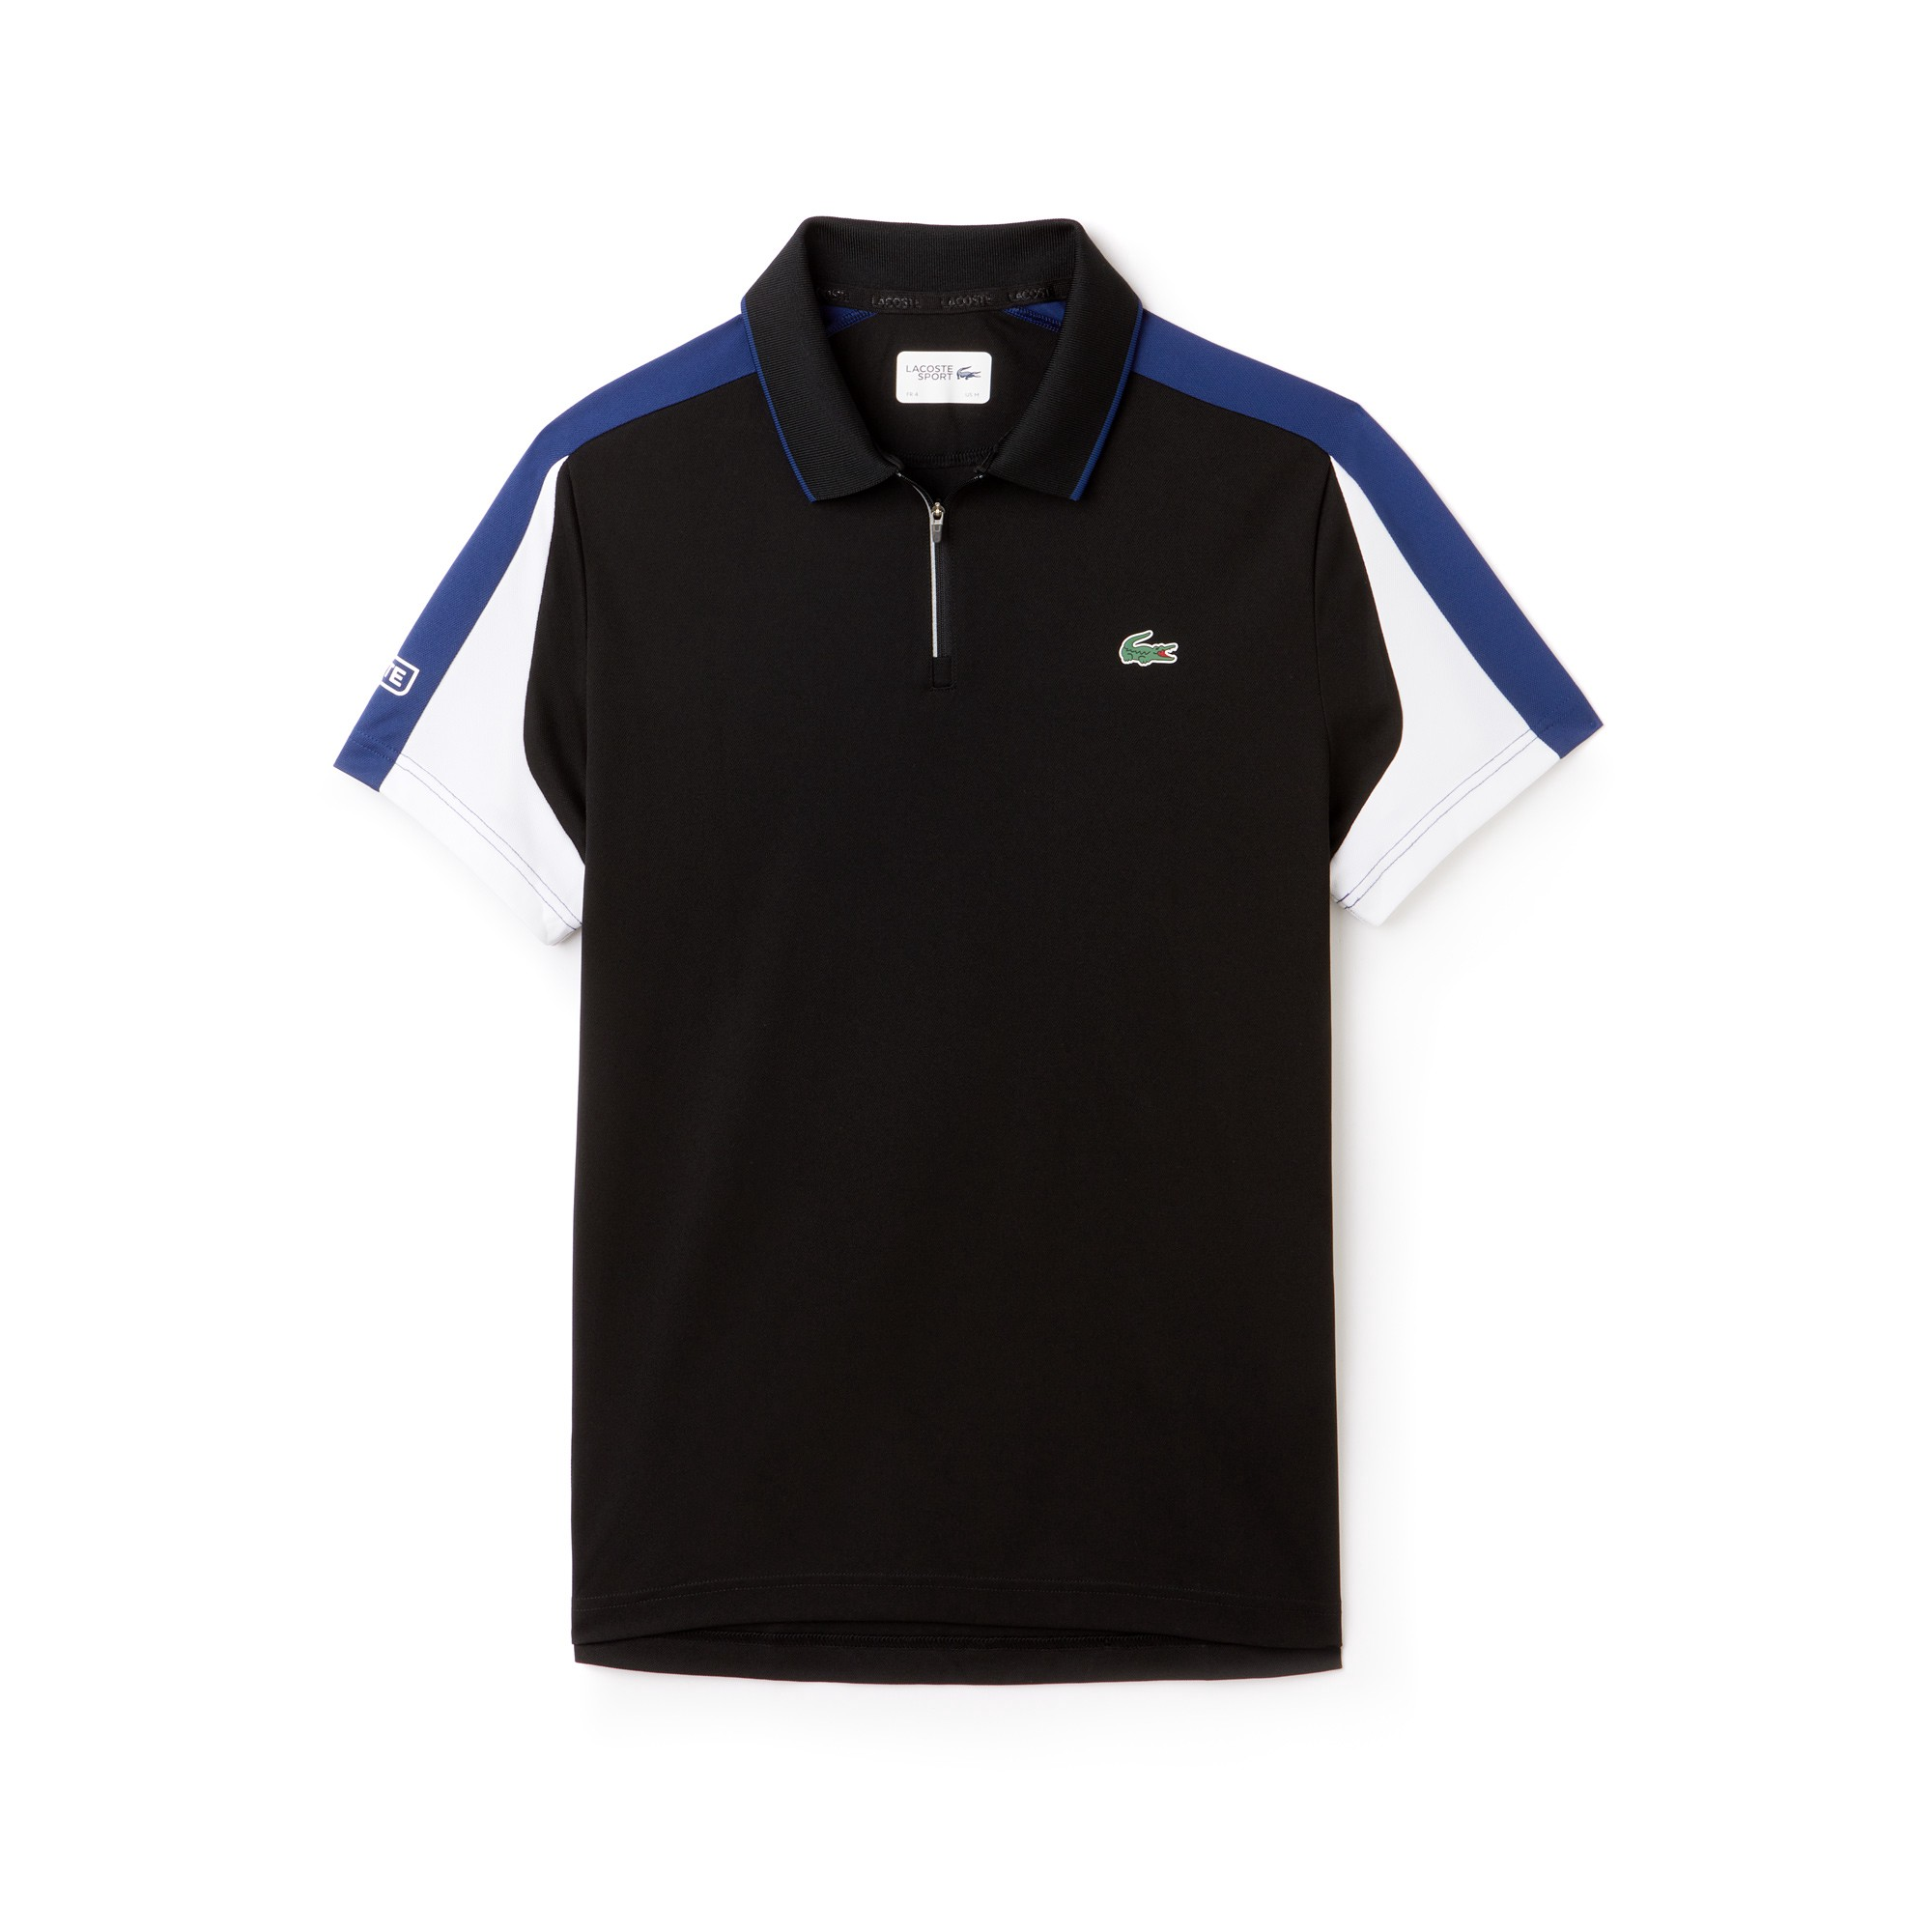 18810d83d0 Lacoste Men's Sport Zip Neck Contrast Bands Piqué Tennis Polo -  Black/Inkwell-White-Armou L Green